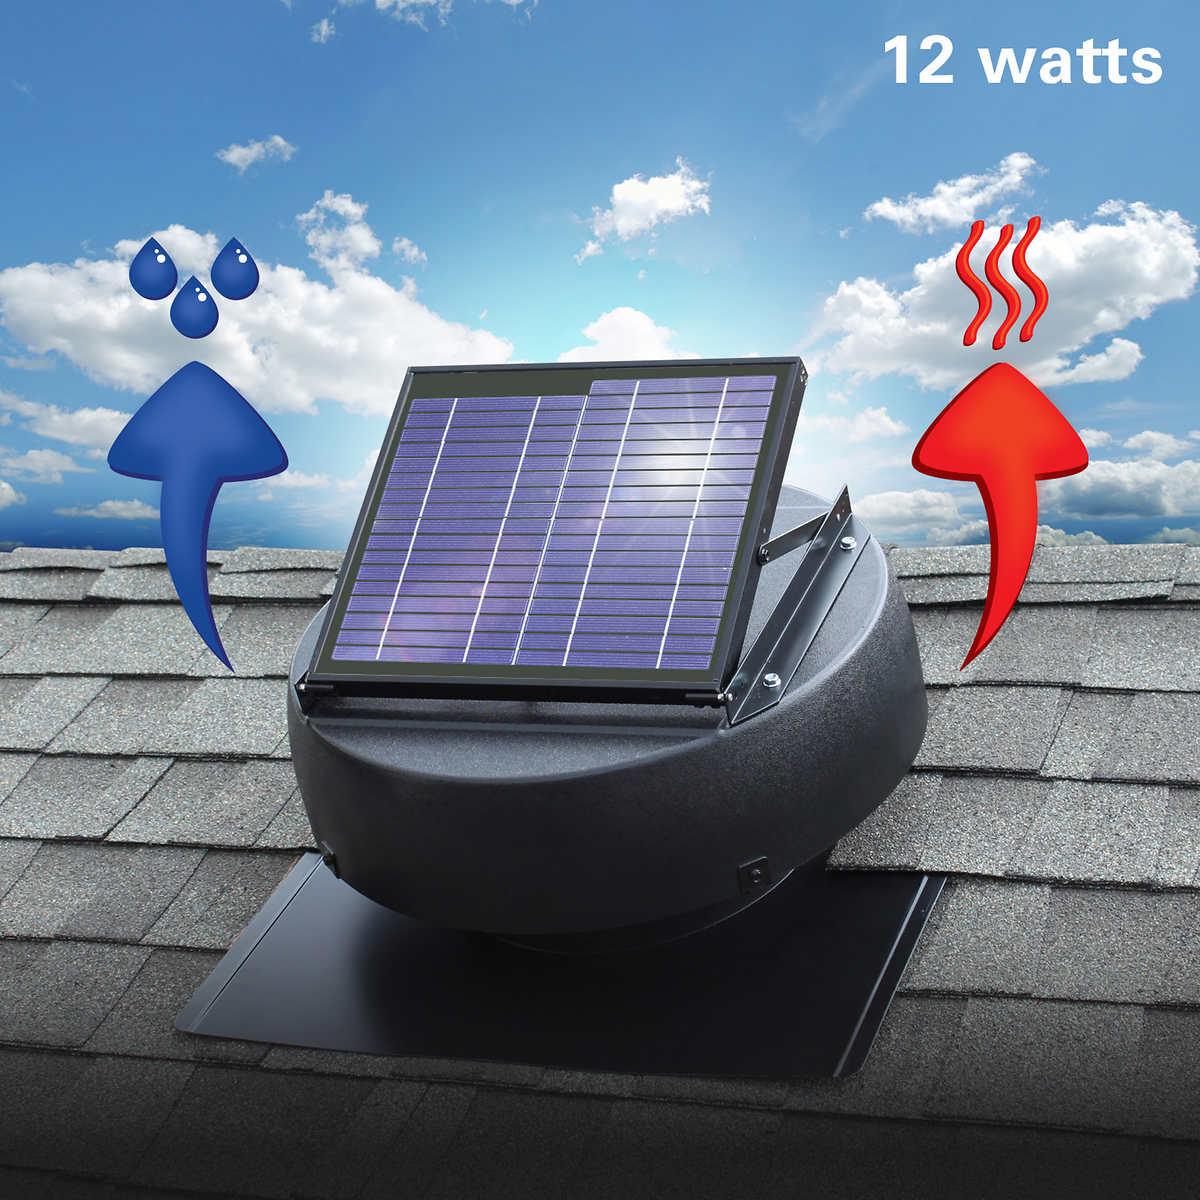 Solar star attic fan complaints - Solar Attic Fan Ventilates 1 350 Sq Ft